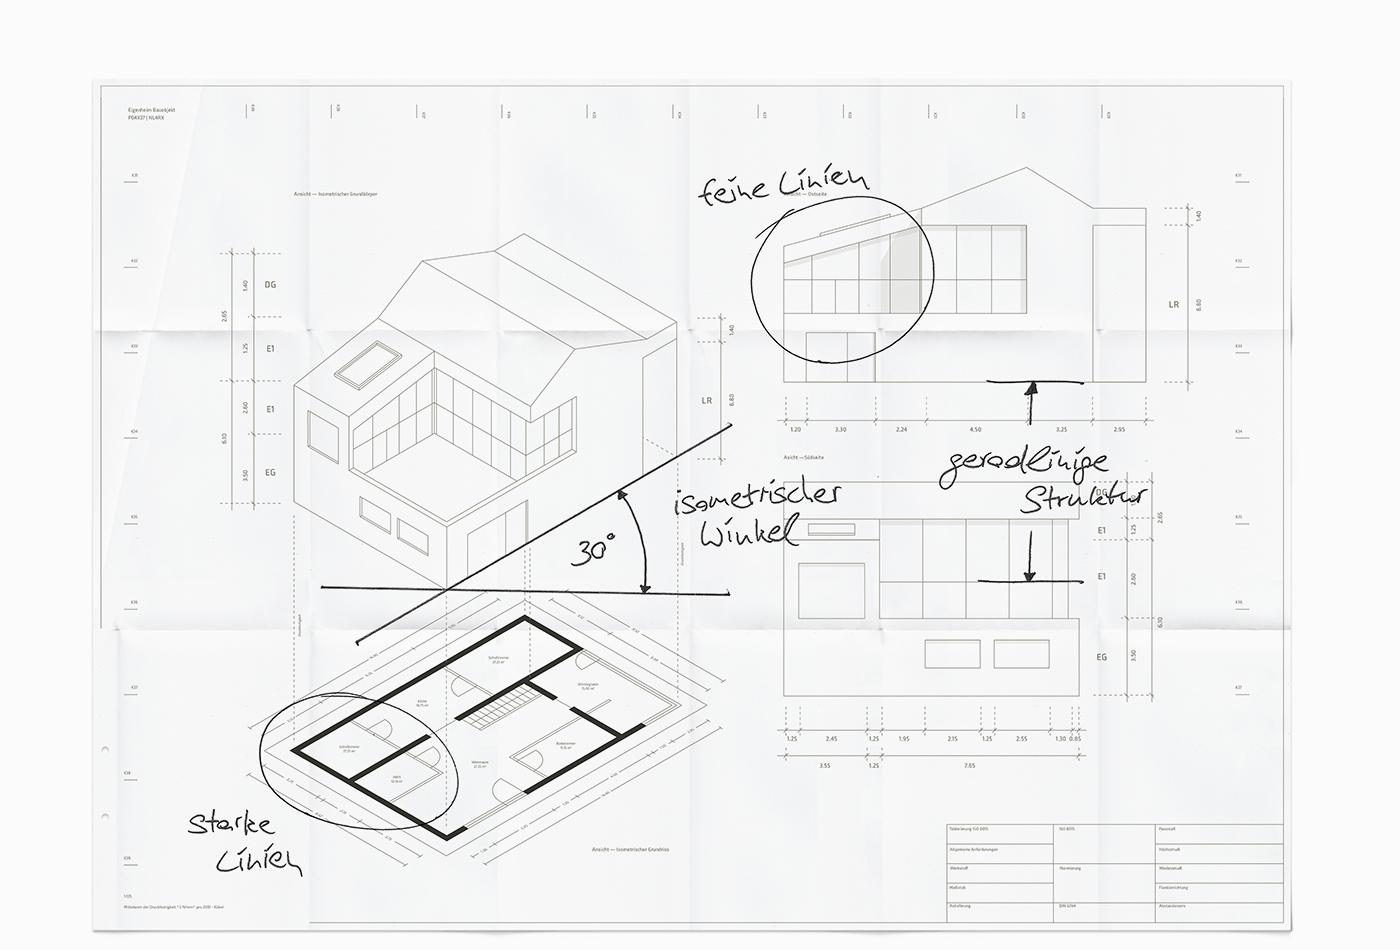 architecture Corporate Design Corporate Identity architektur Brand Development concrete Photography  Visual Communication visual identity beton